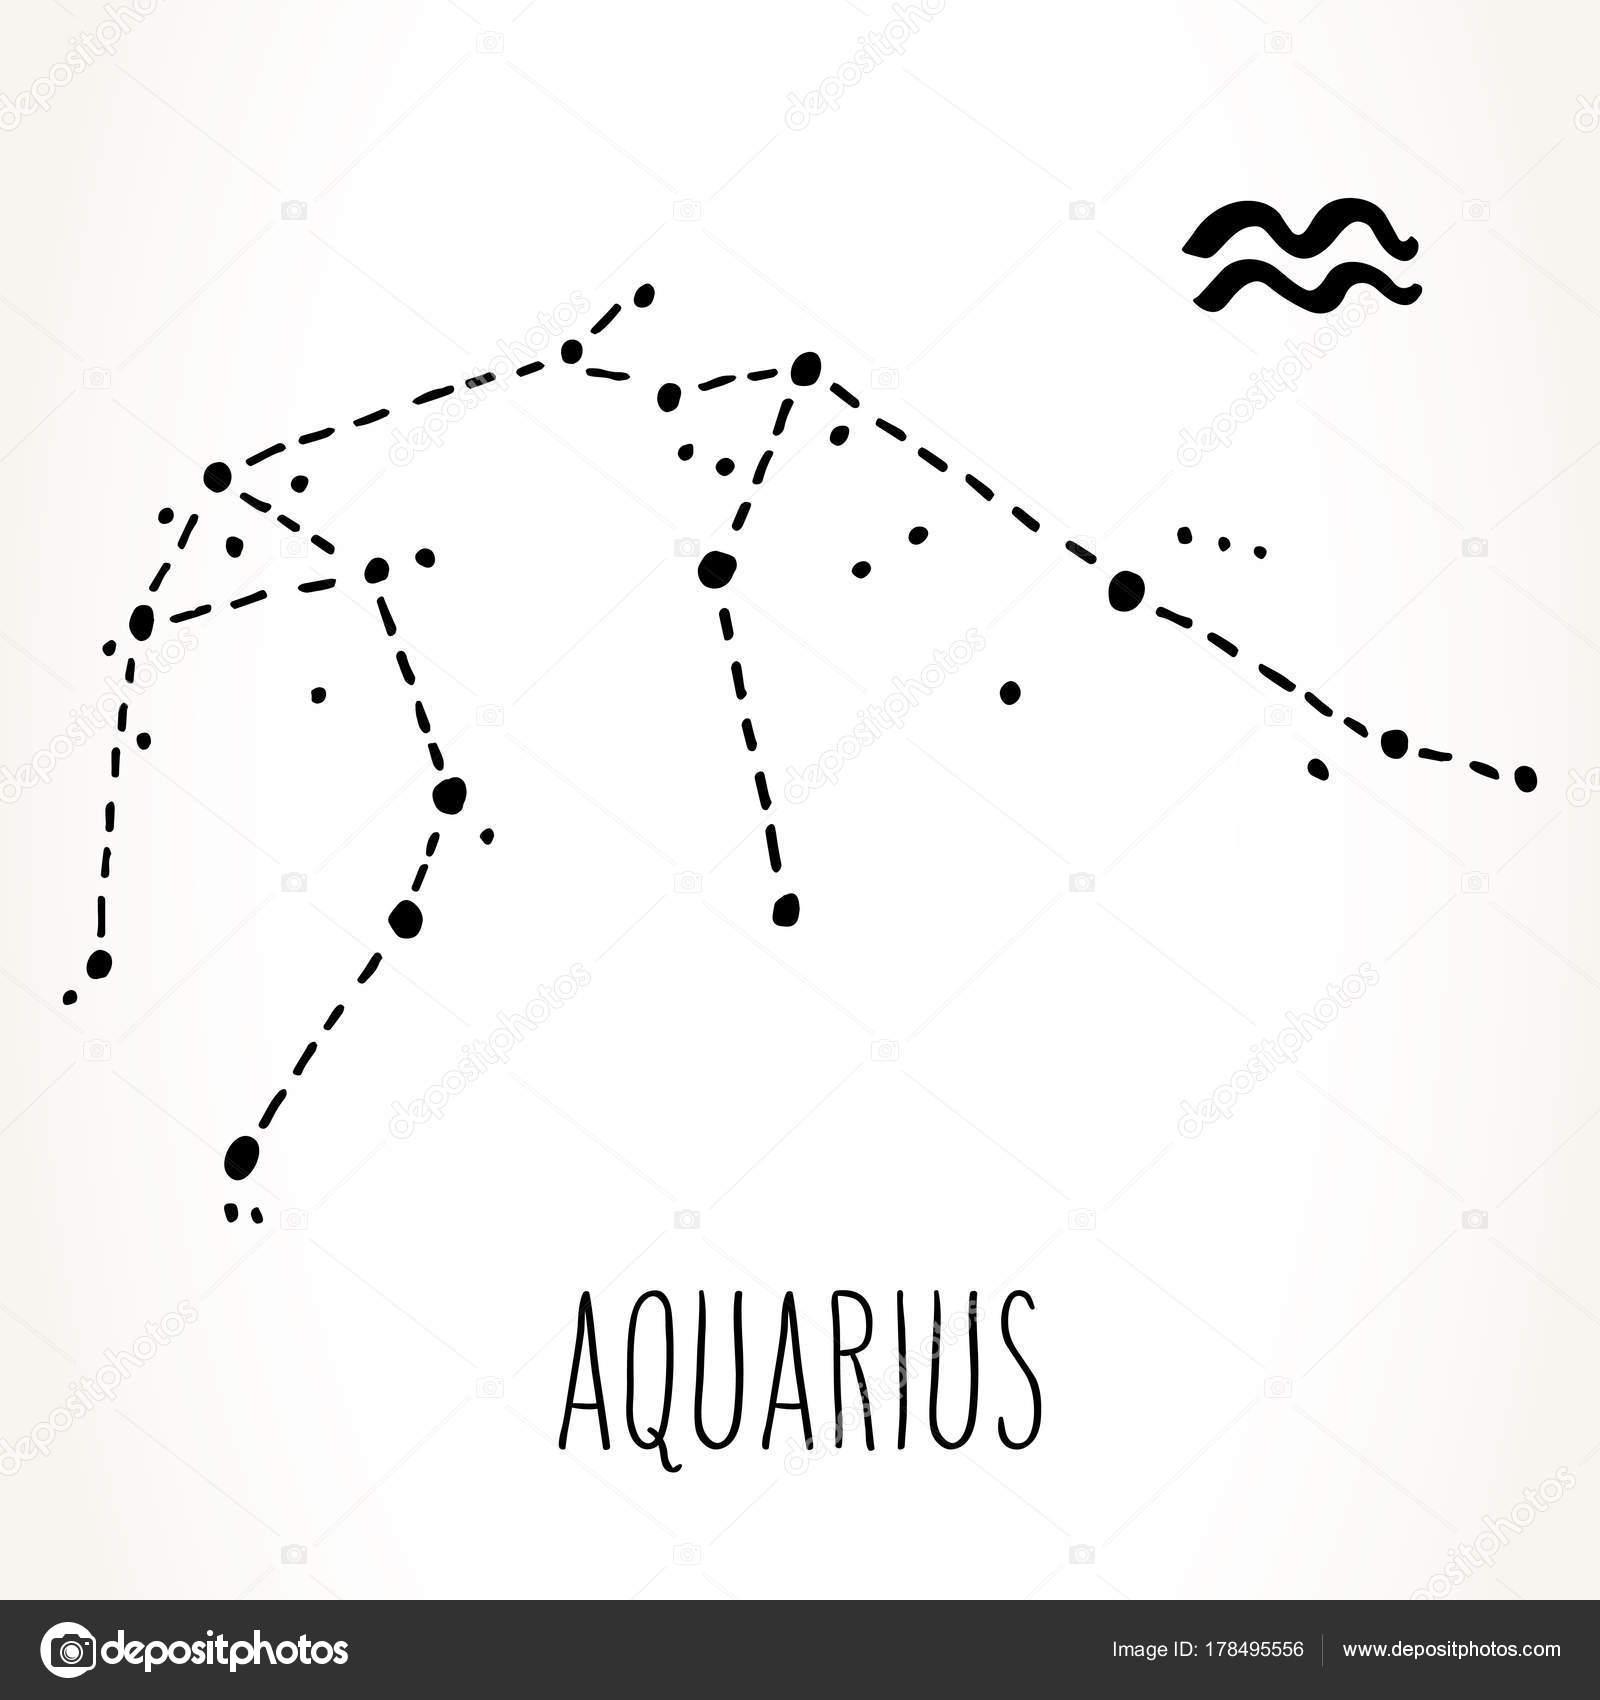 Constelao de aquarius zodiac sign vetores de stock de kay aquarius mo desenhada zodiac sinal constelao preto isolado sobre fundo branco ilustrao de astrologia de grficos vetoriais ccuart Gallery